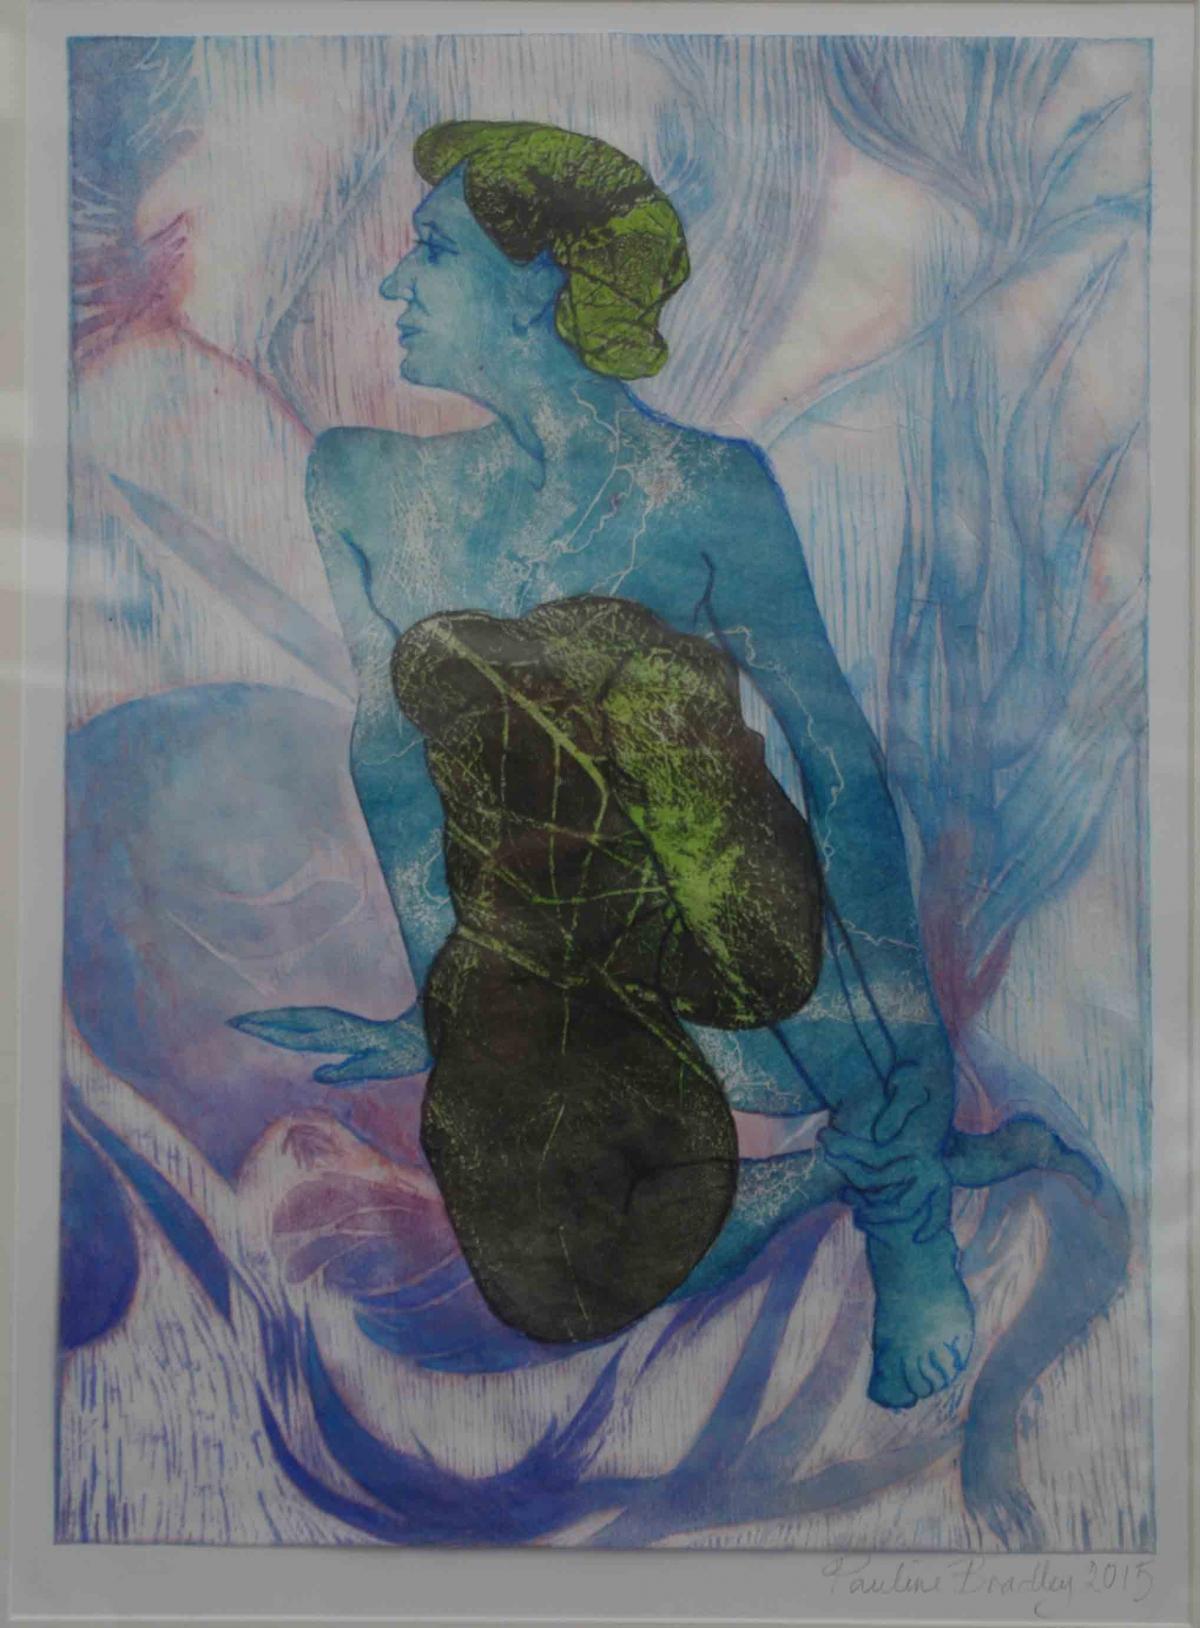 Blue Lady - Variation 8